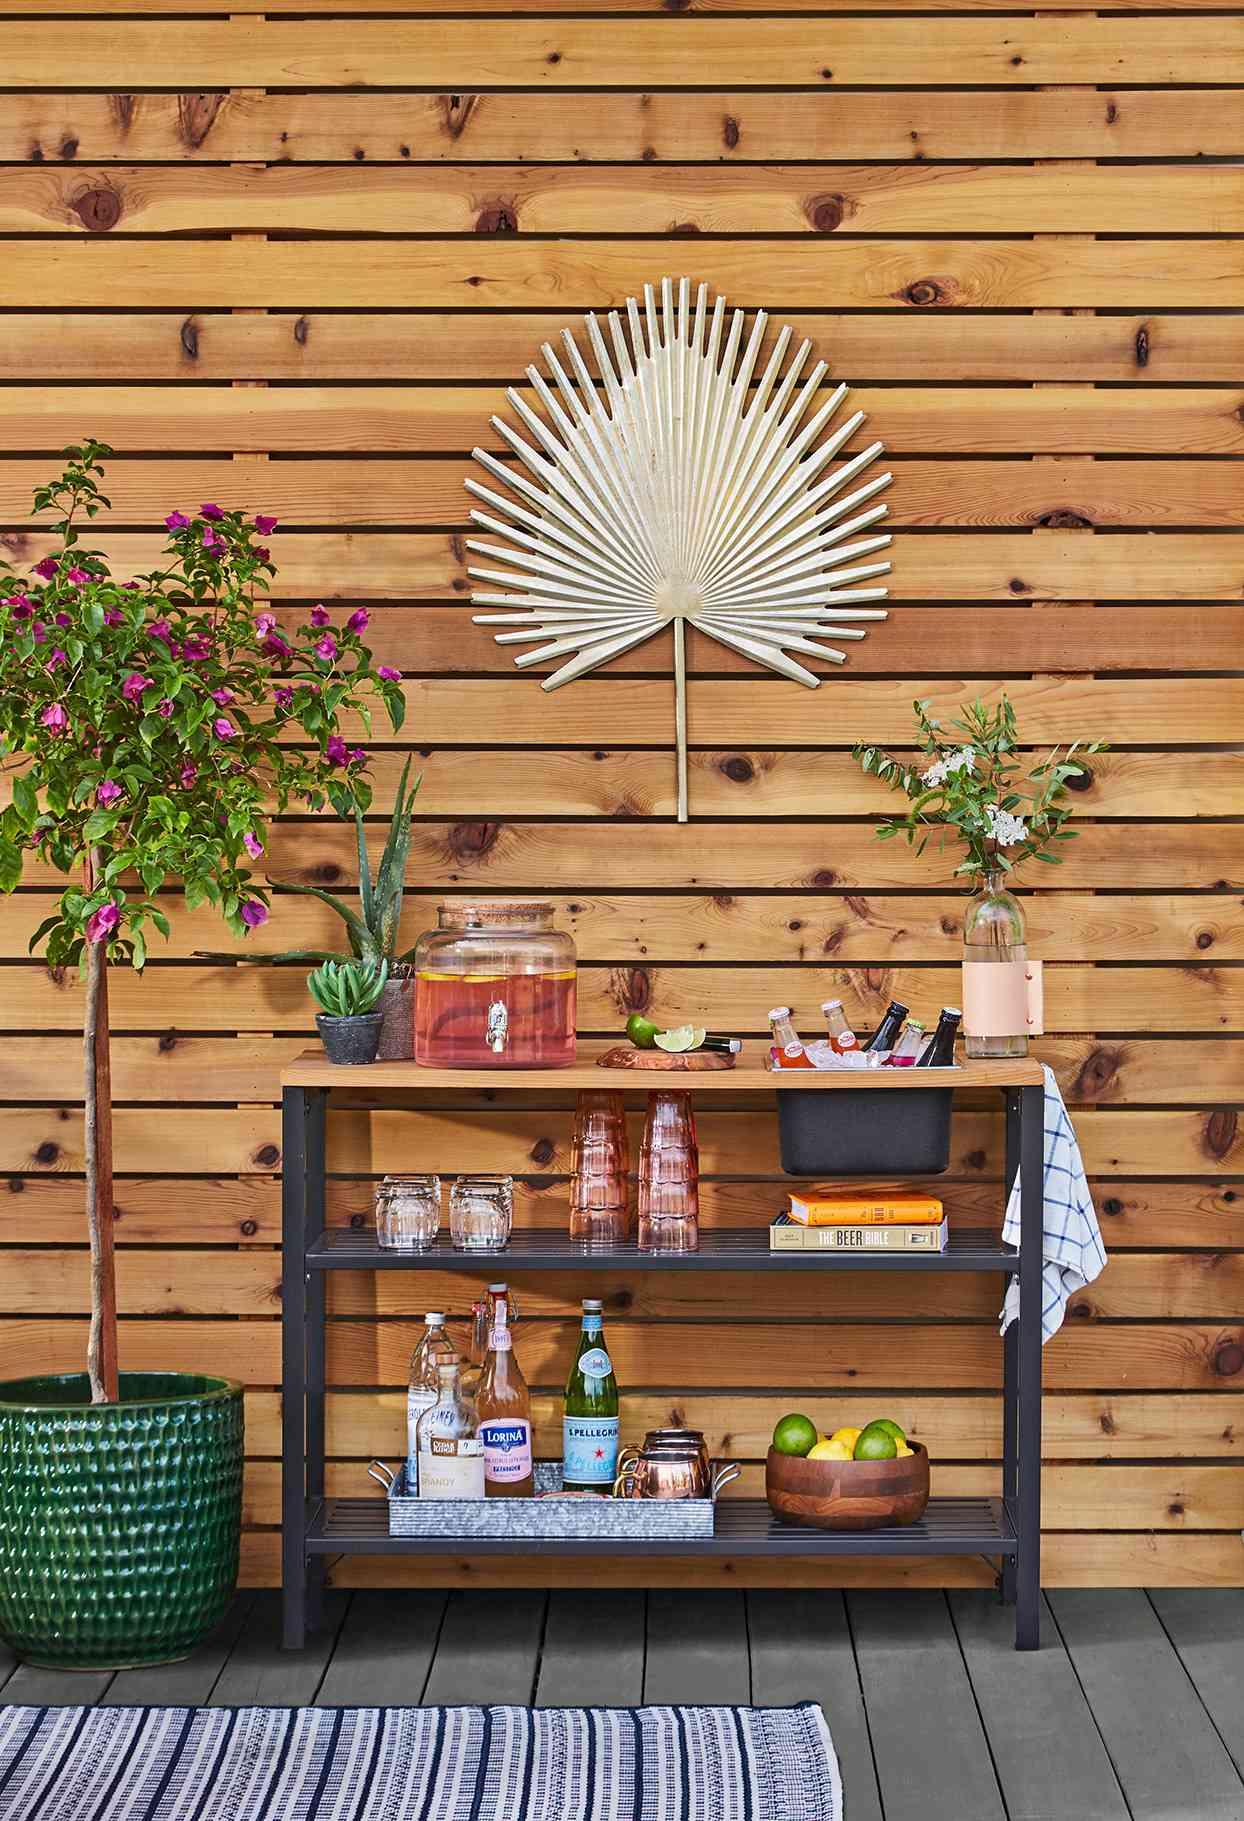 18 diy outdoor storage ideas to